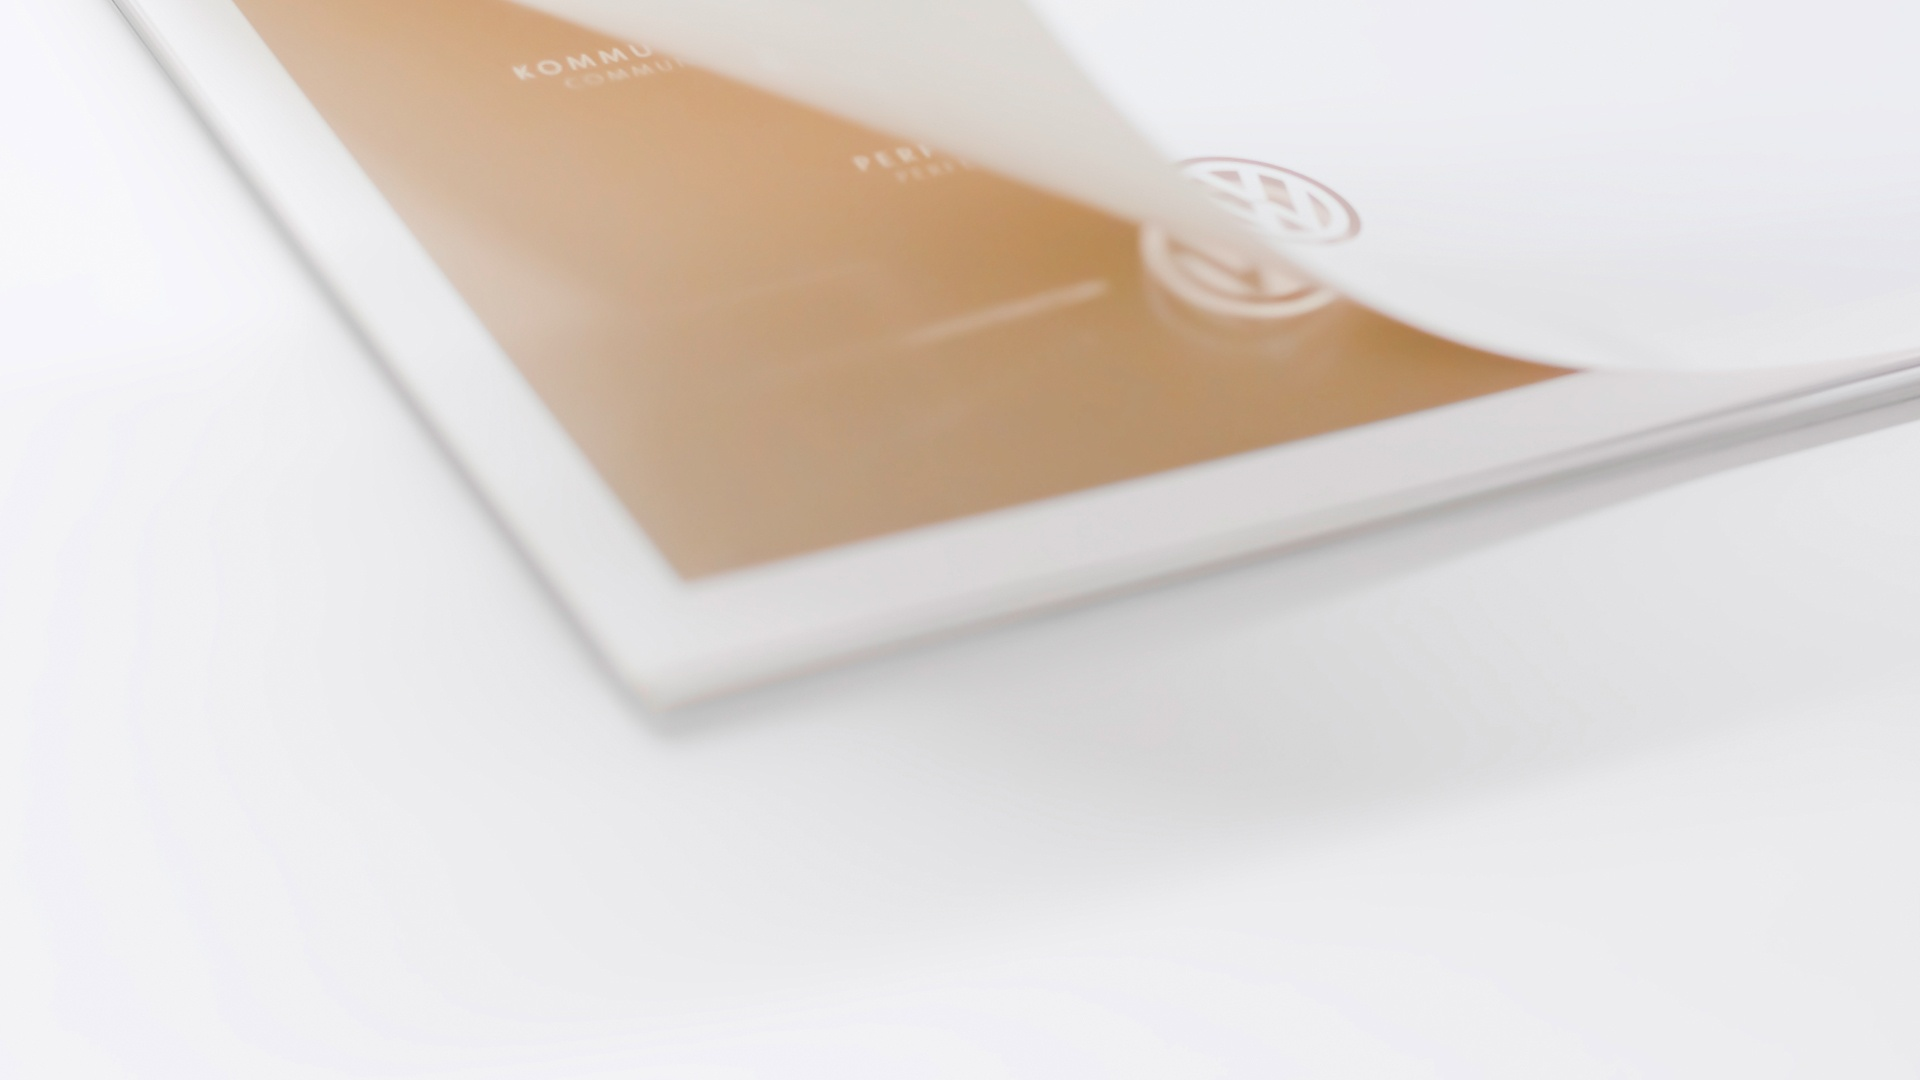 Siebdruck Typografie Gläserne Manufaktur Kalender VW